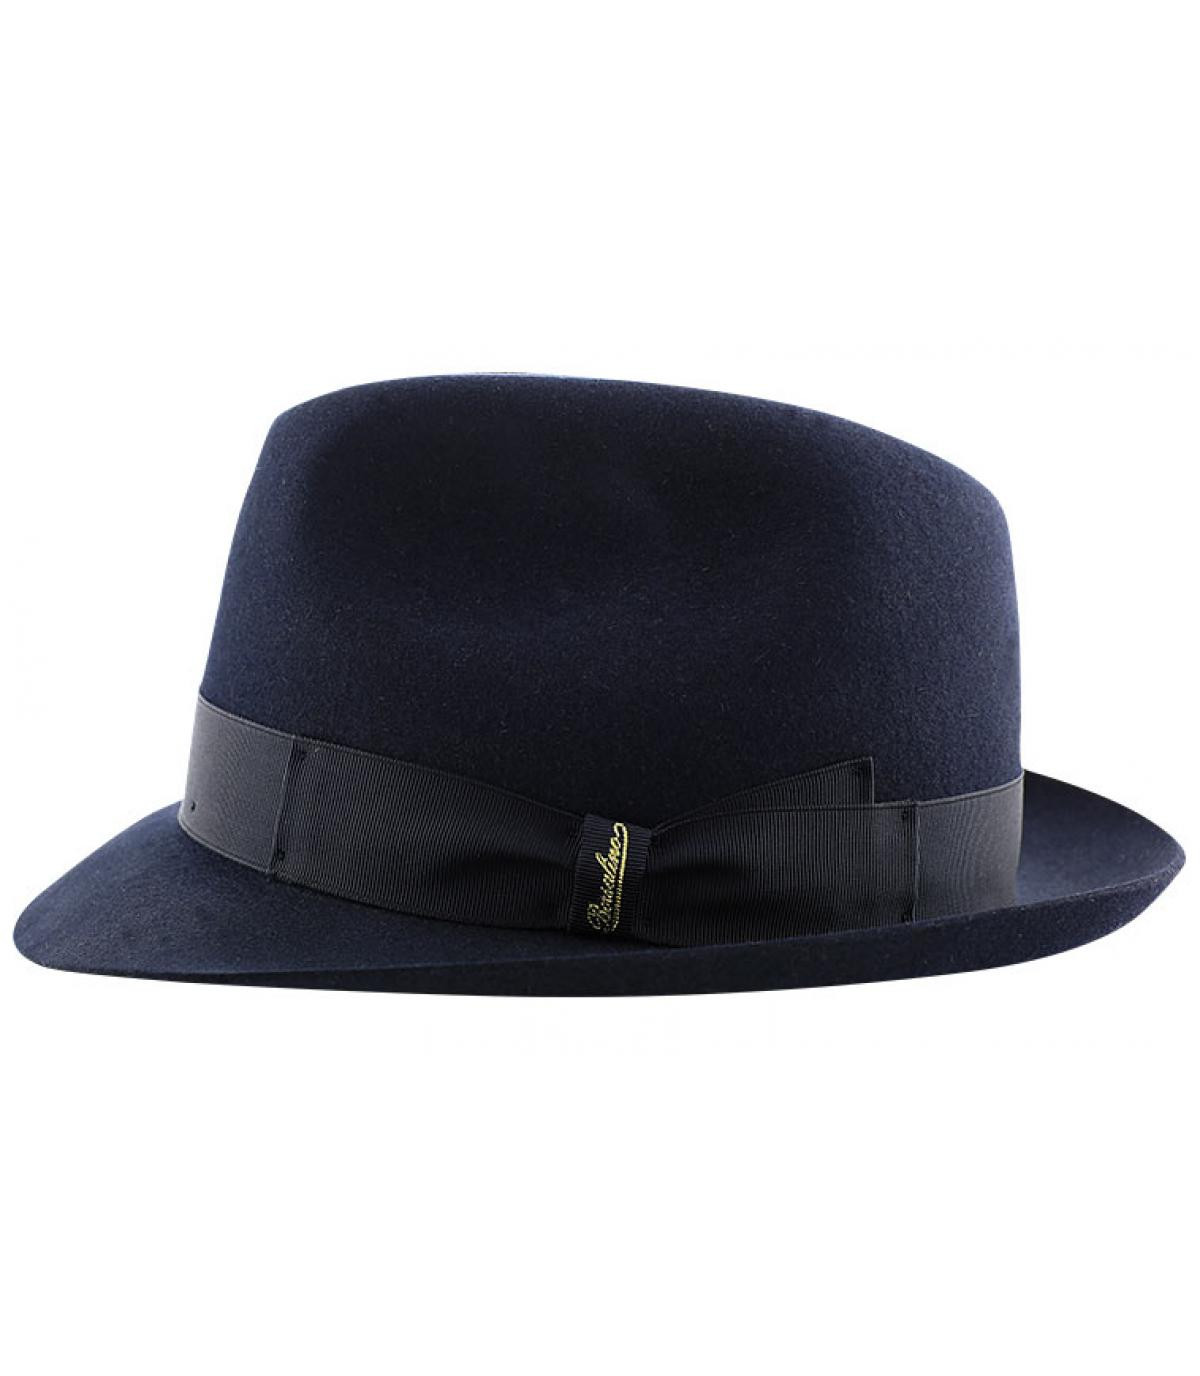 8343f53310c Navy fur felt Borsalino hat. Détails Marengo navy fur felt hat - image 4 ...